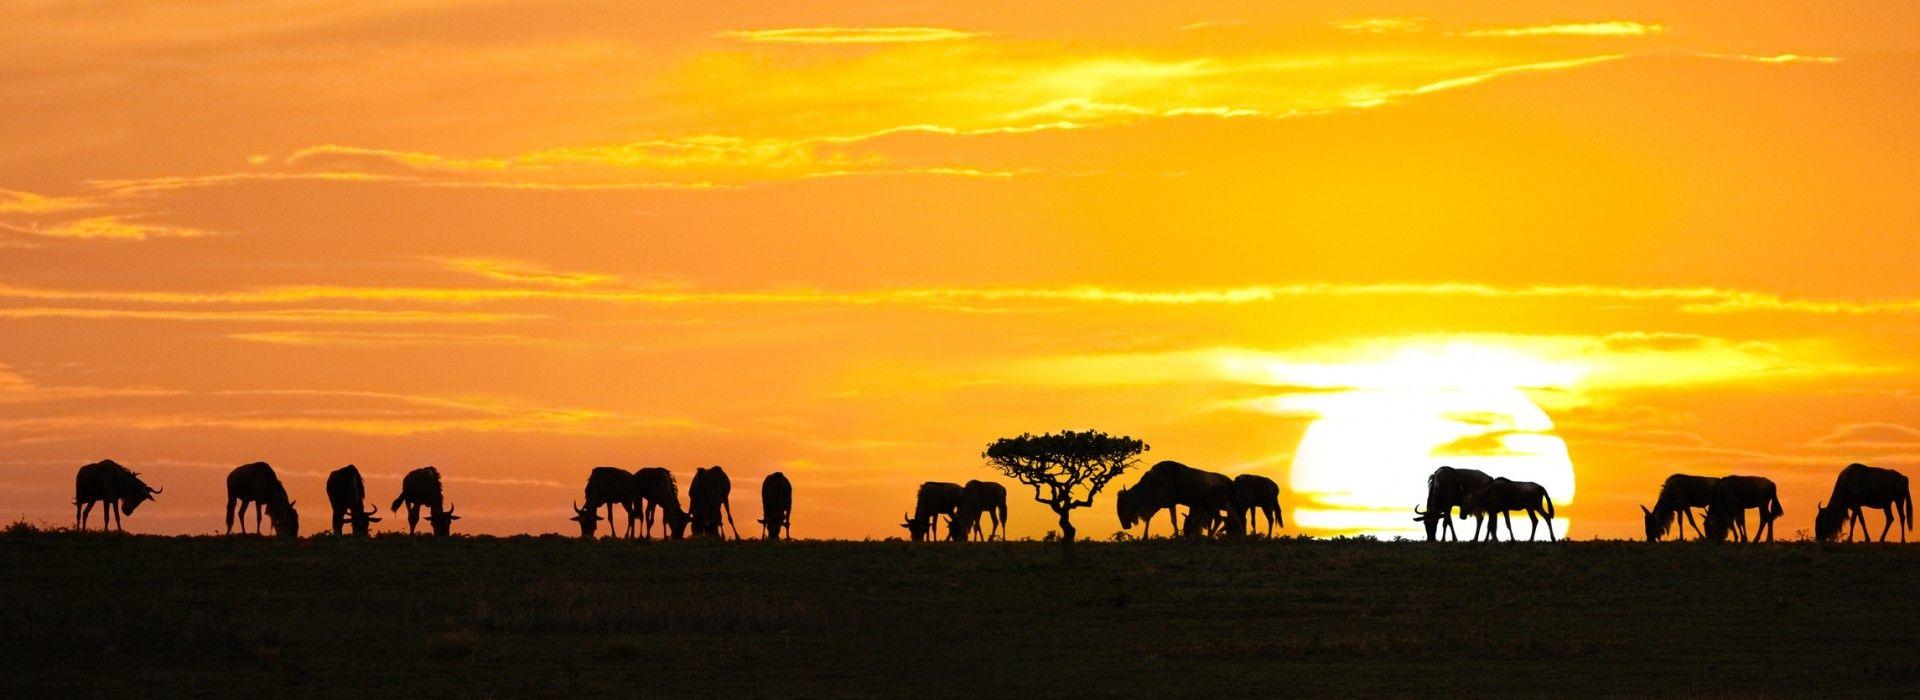 Family Tours in Tanzania